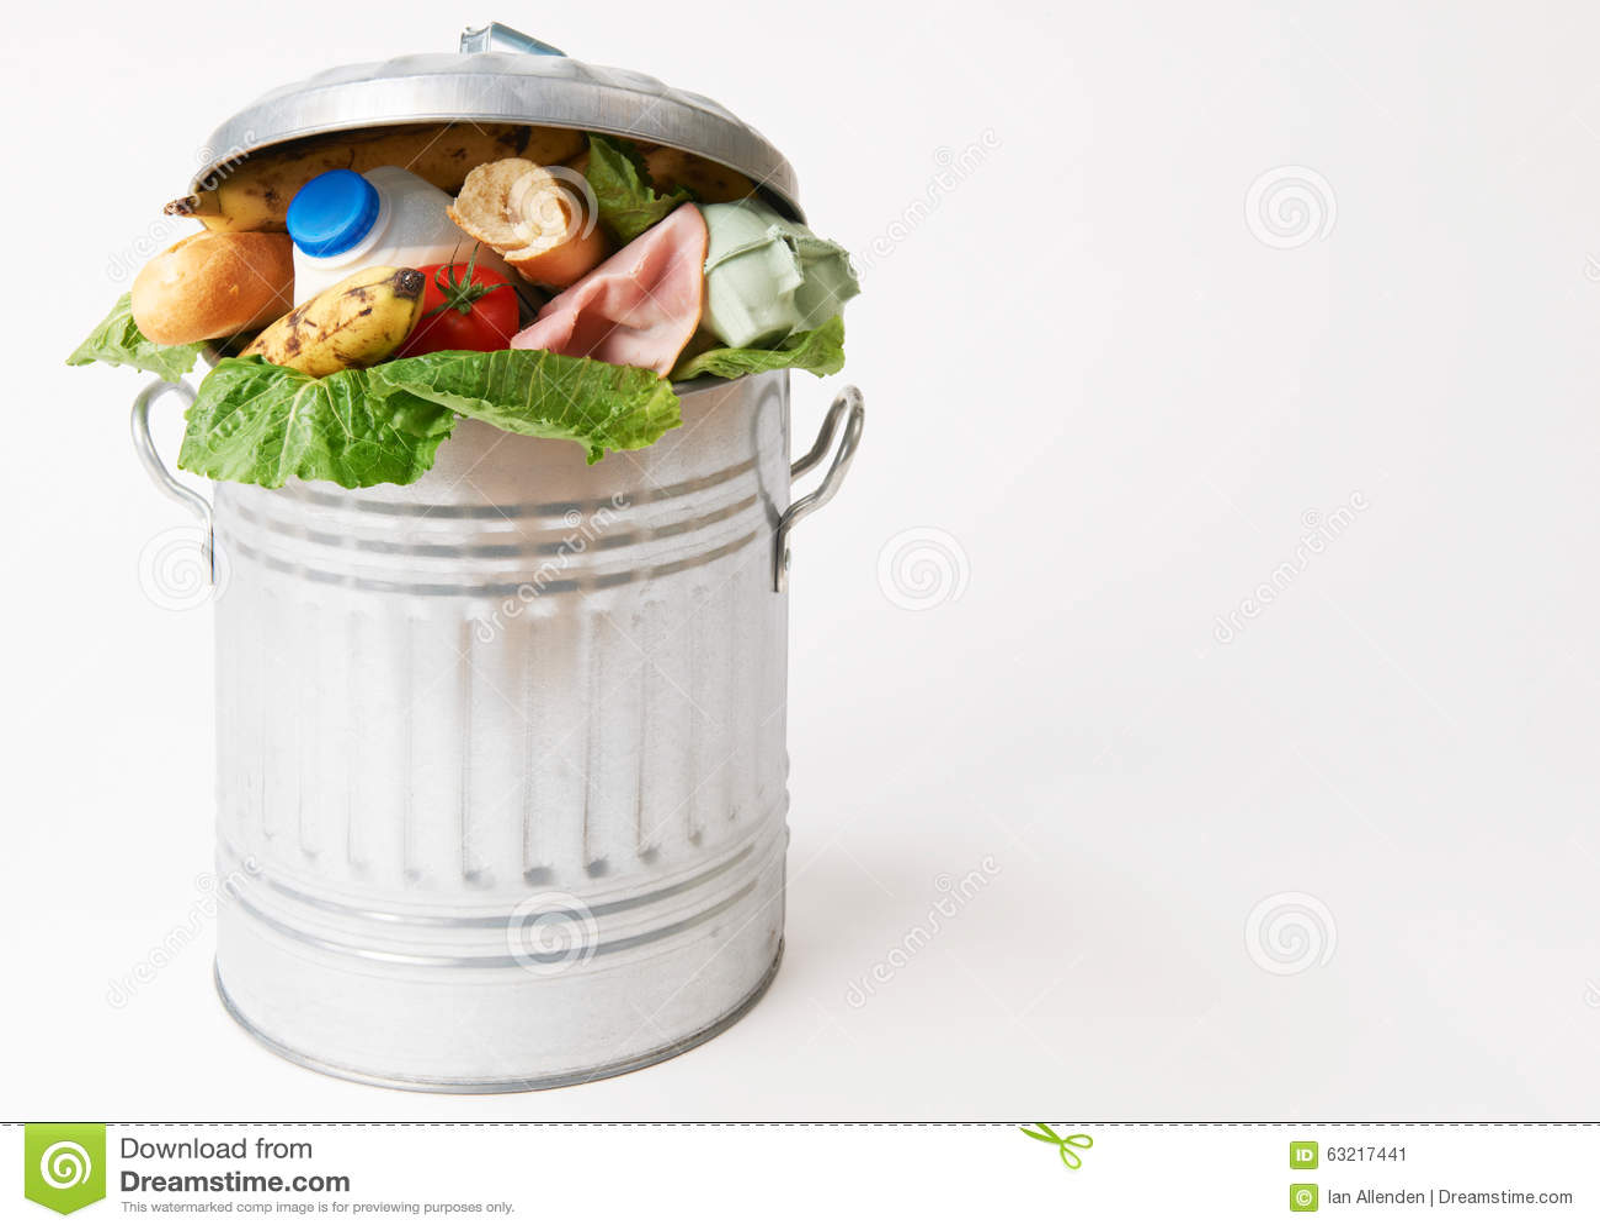 canned food vs fresh food essay